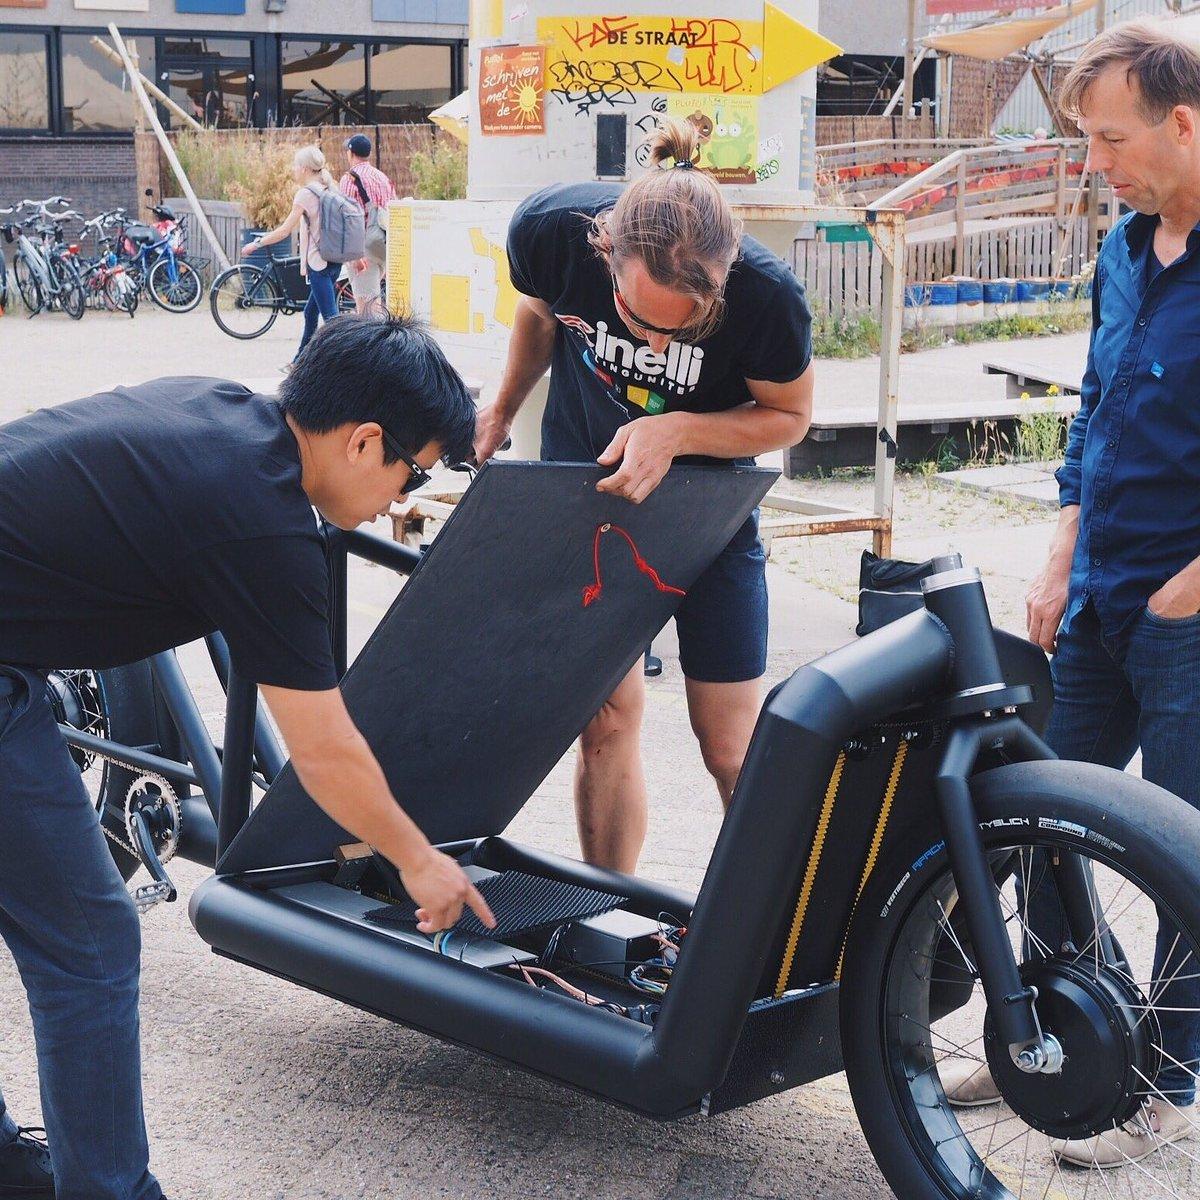 Check this out :  https://www. instagram.com/p/BVwPiywAQRy/  &nbsp;   #diy #motorcycle #maker #makerfairekc #makered #builtforit #builtnotbought #BuiltToLast #ebike<br>http://pic.twitter.com/3JAIyQRiPD